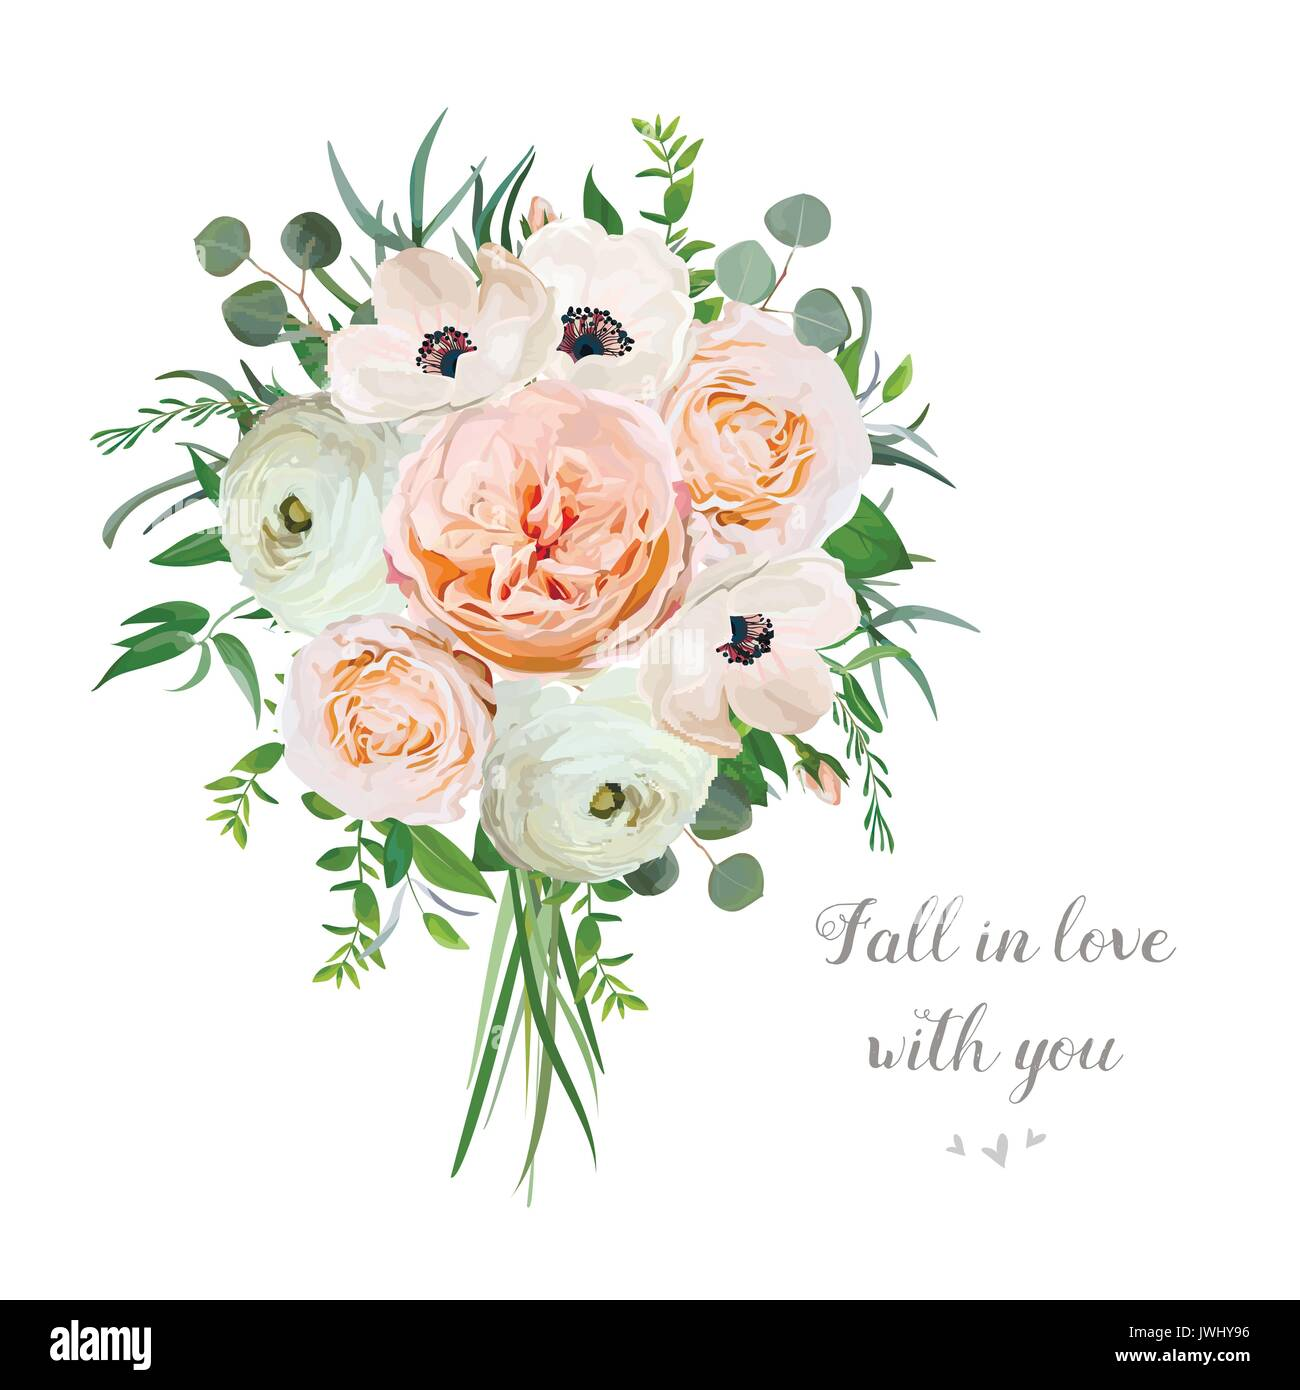 Flower Floral Vector Bouquet Of Garden Pink Rose Anemone Ranunculus Stock Vector Image Art Alamy